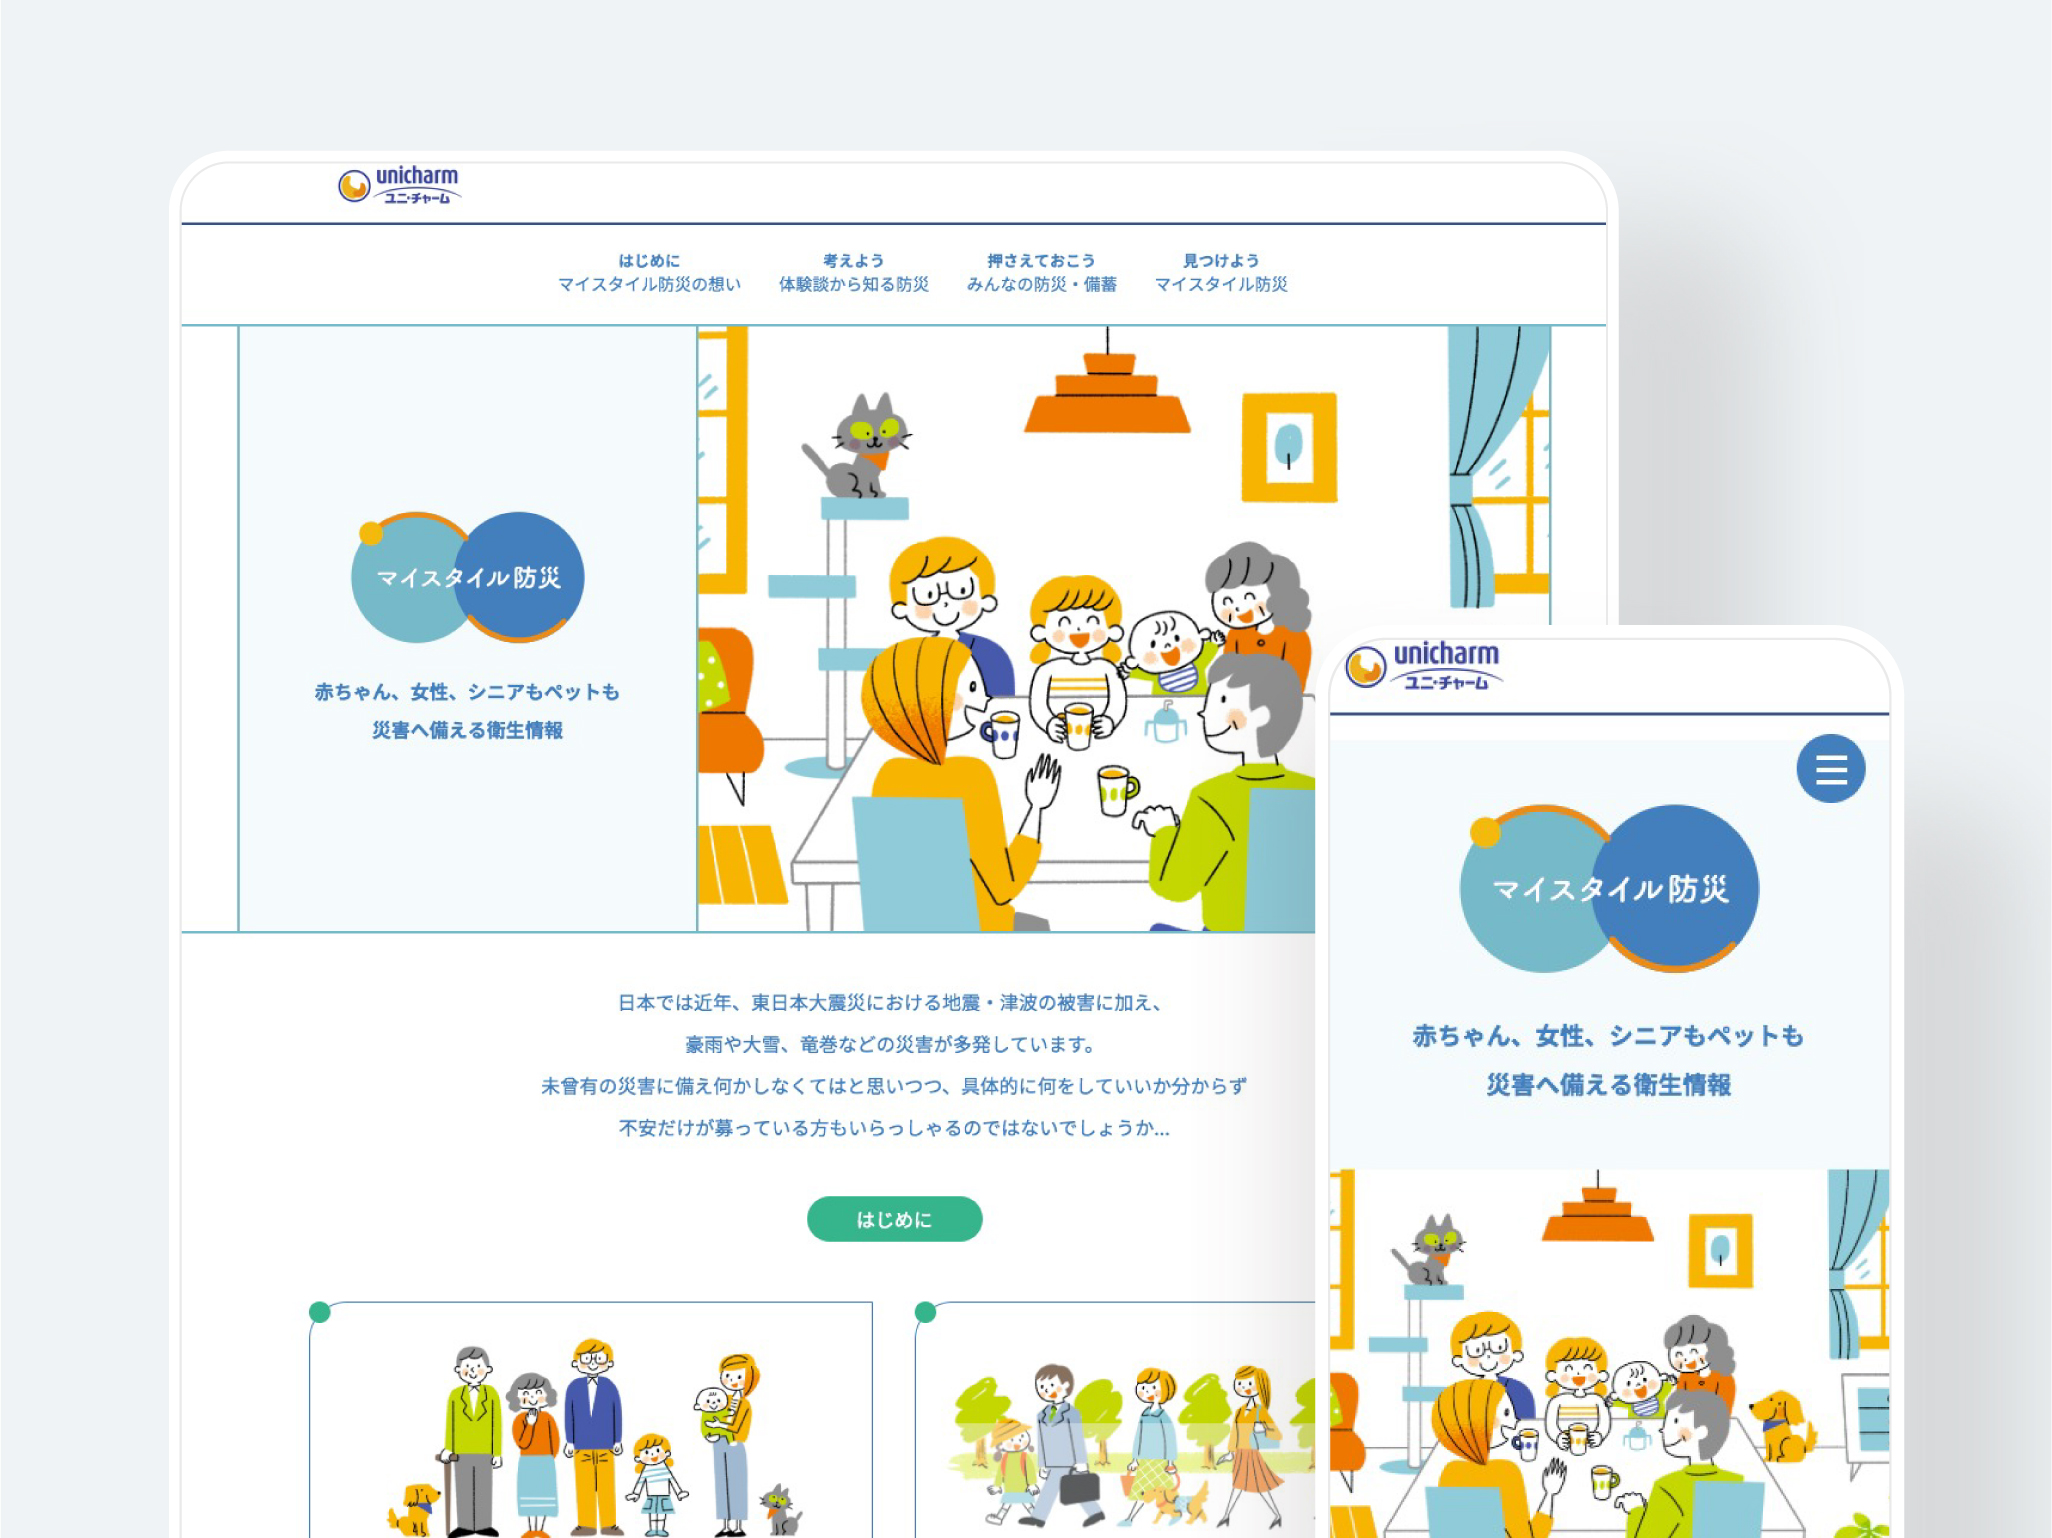 CSR防災 WEBサイト| ユニチャーム マイスタイル防災